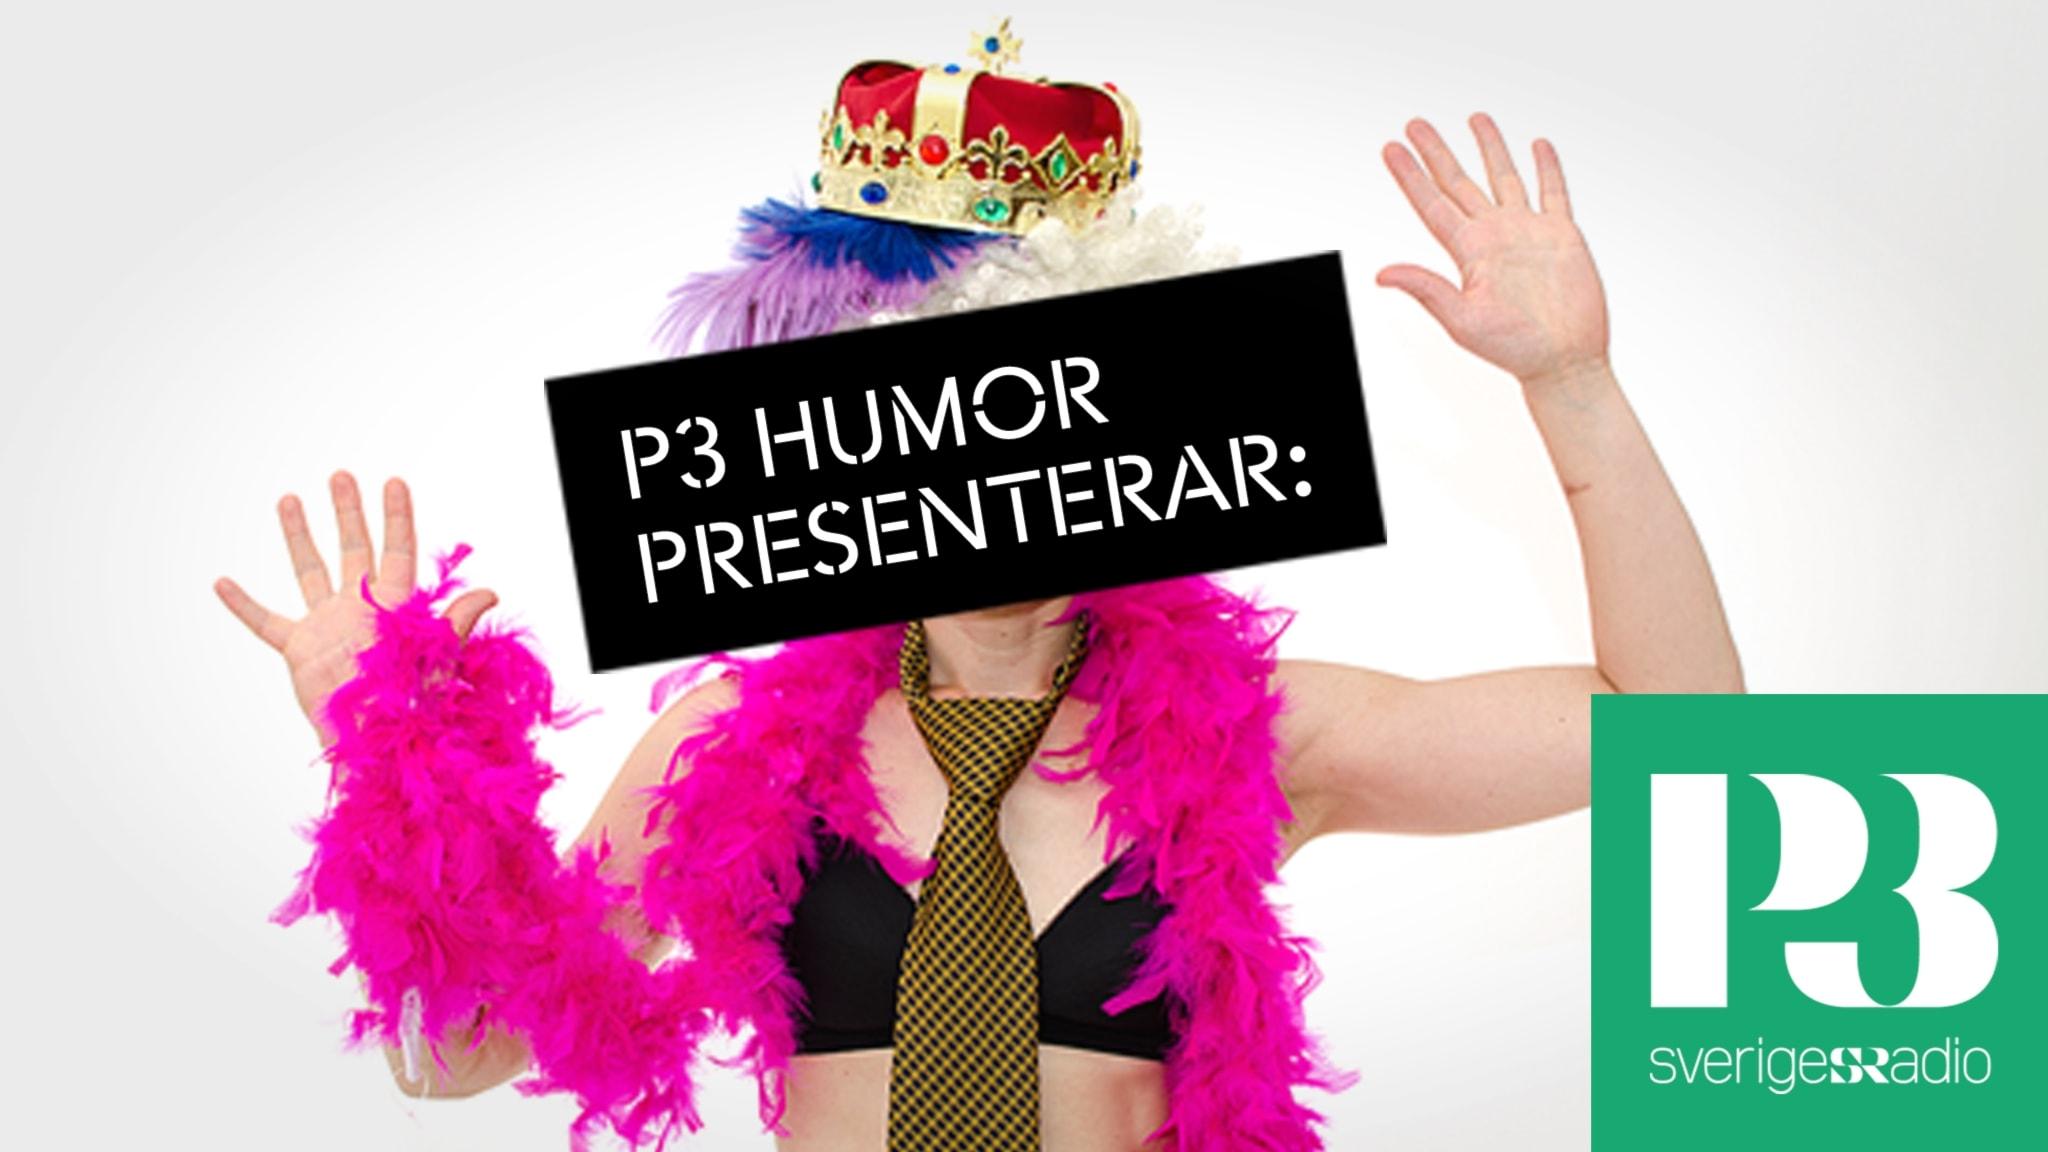 P3 Humor presenterar: